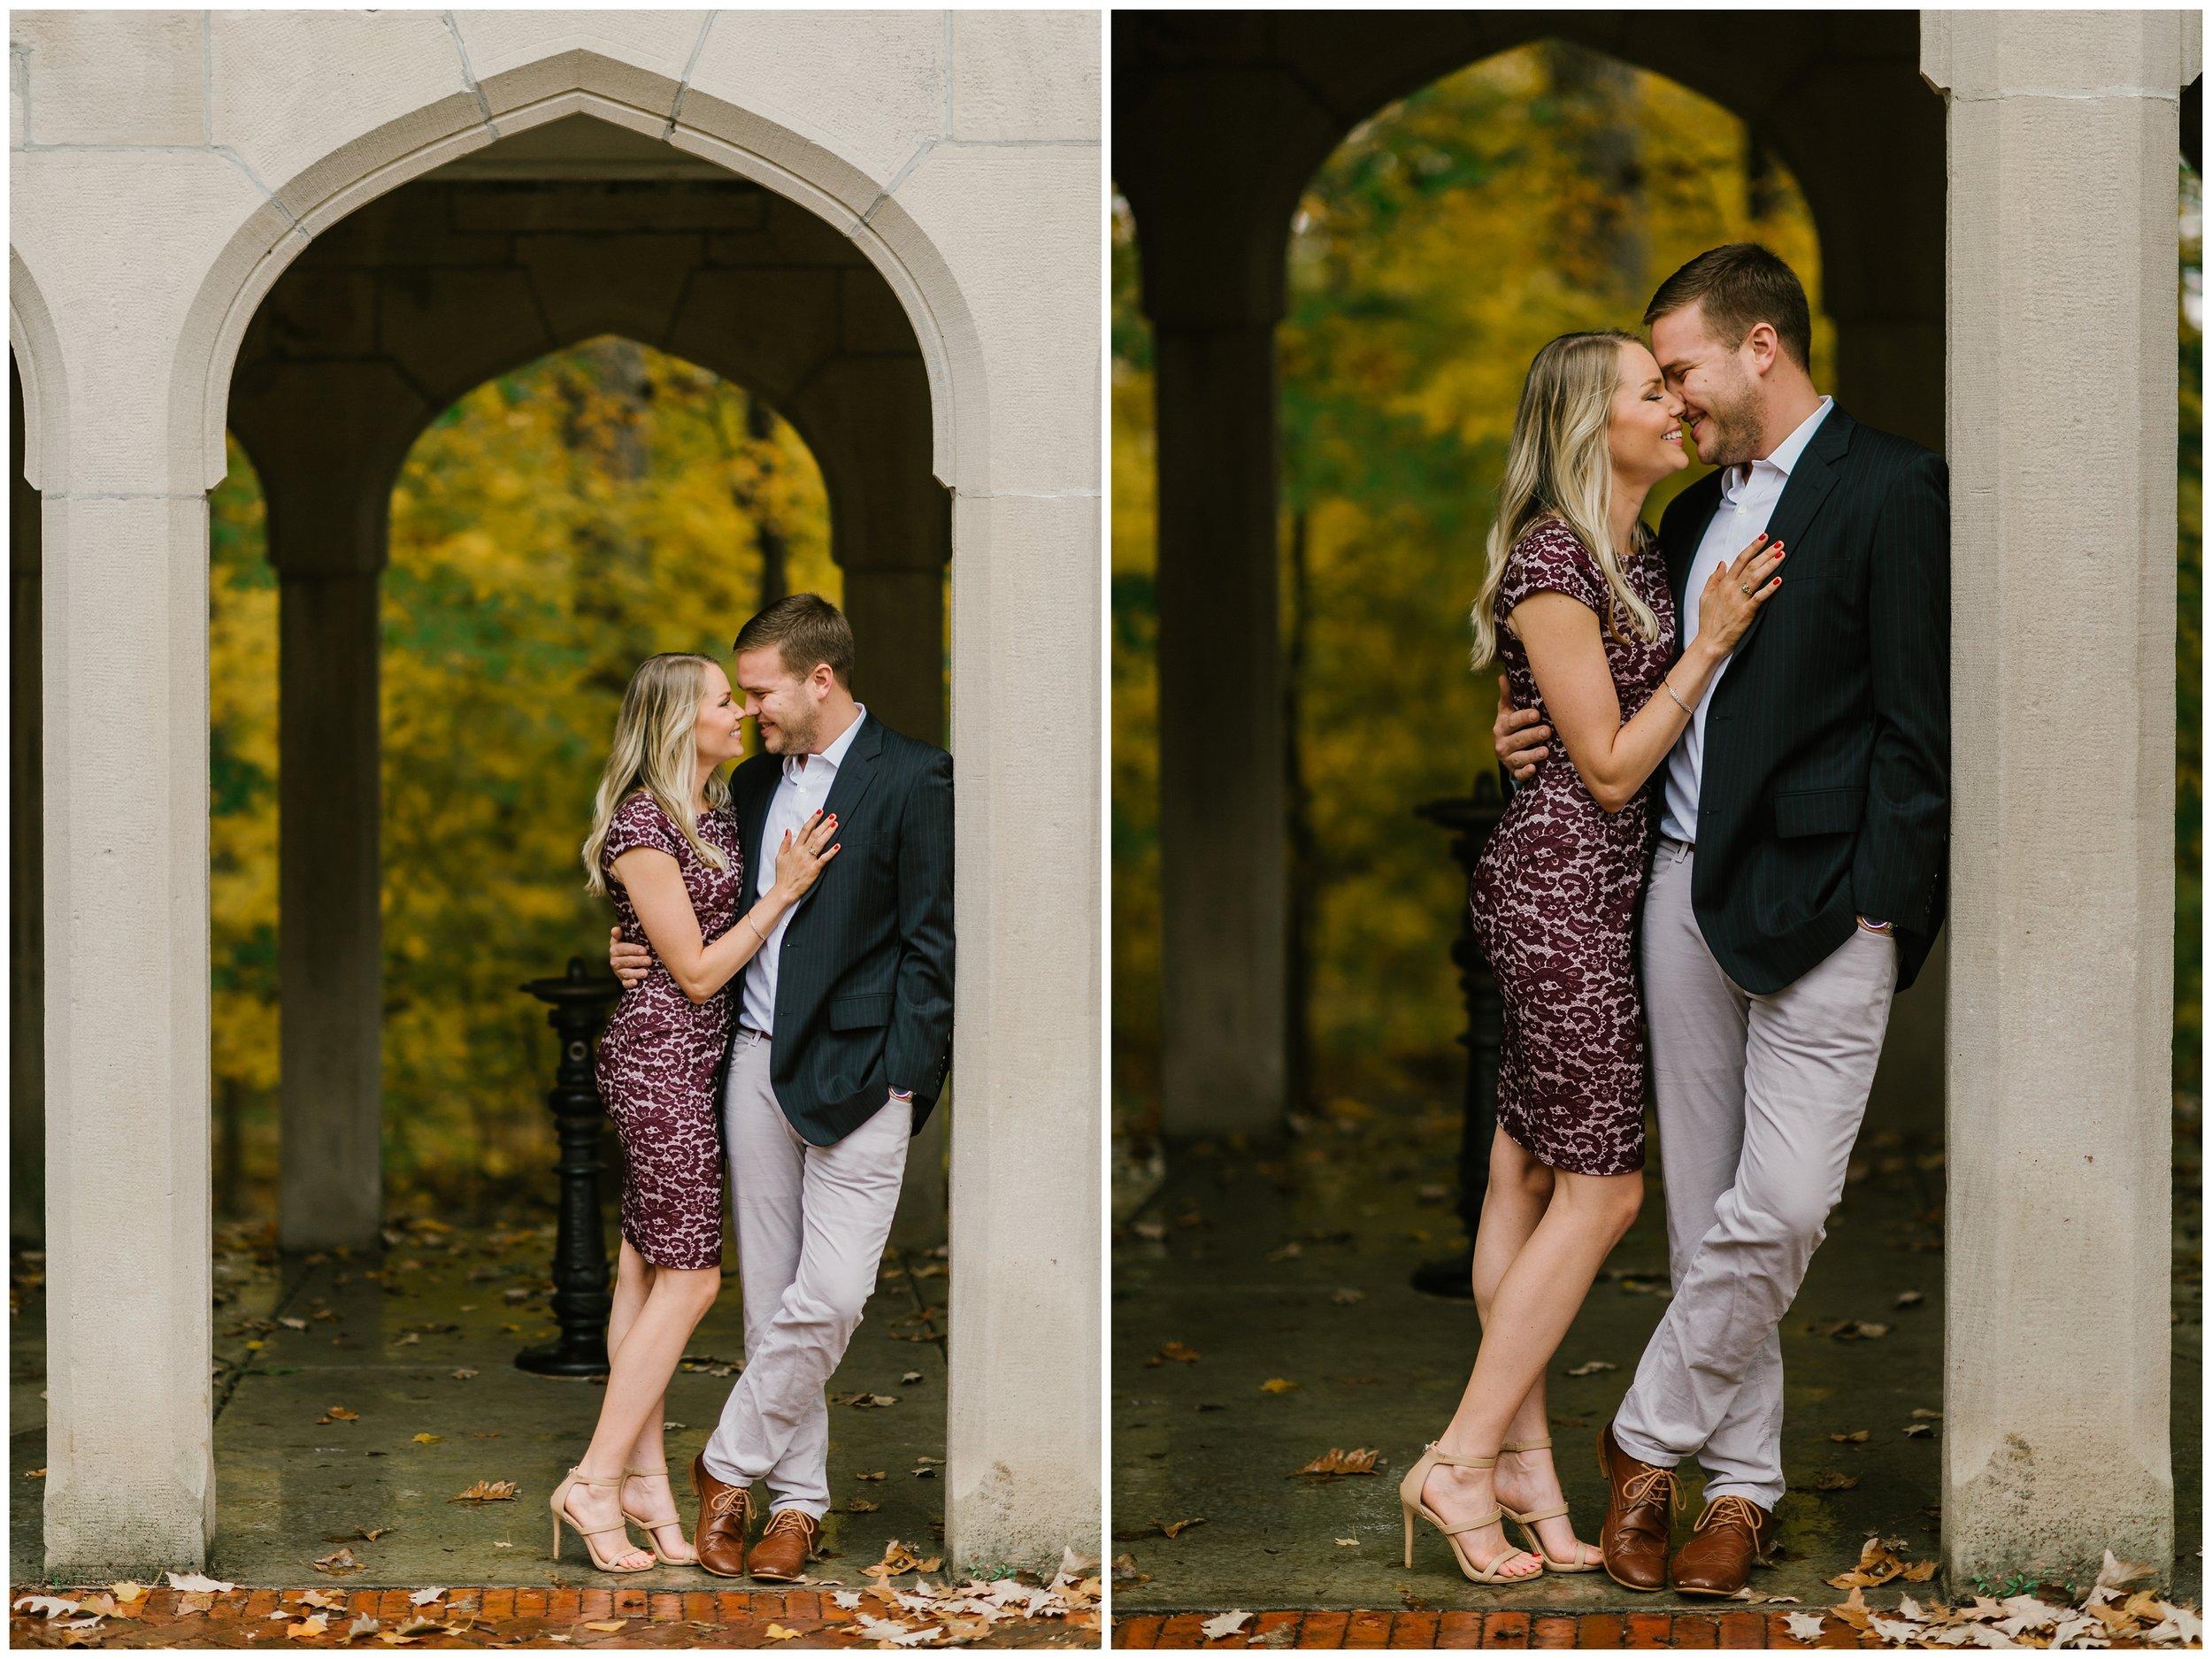 Rebecca_Shehorn_Photography_Indianapolis_Wedding_Photographer_7682.jpg